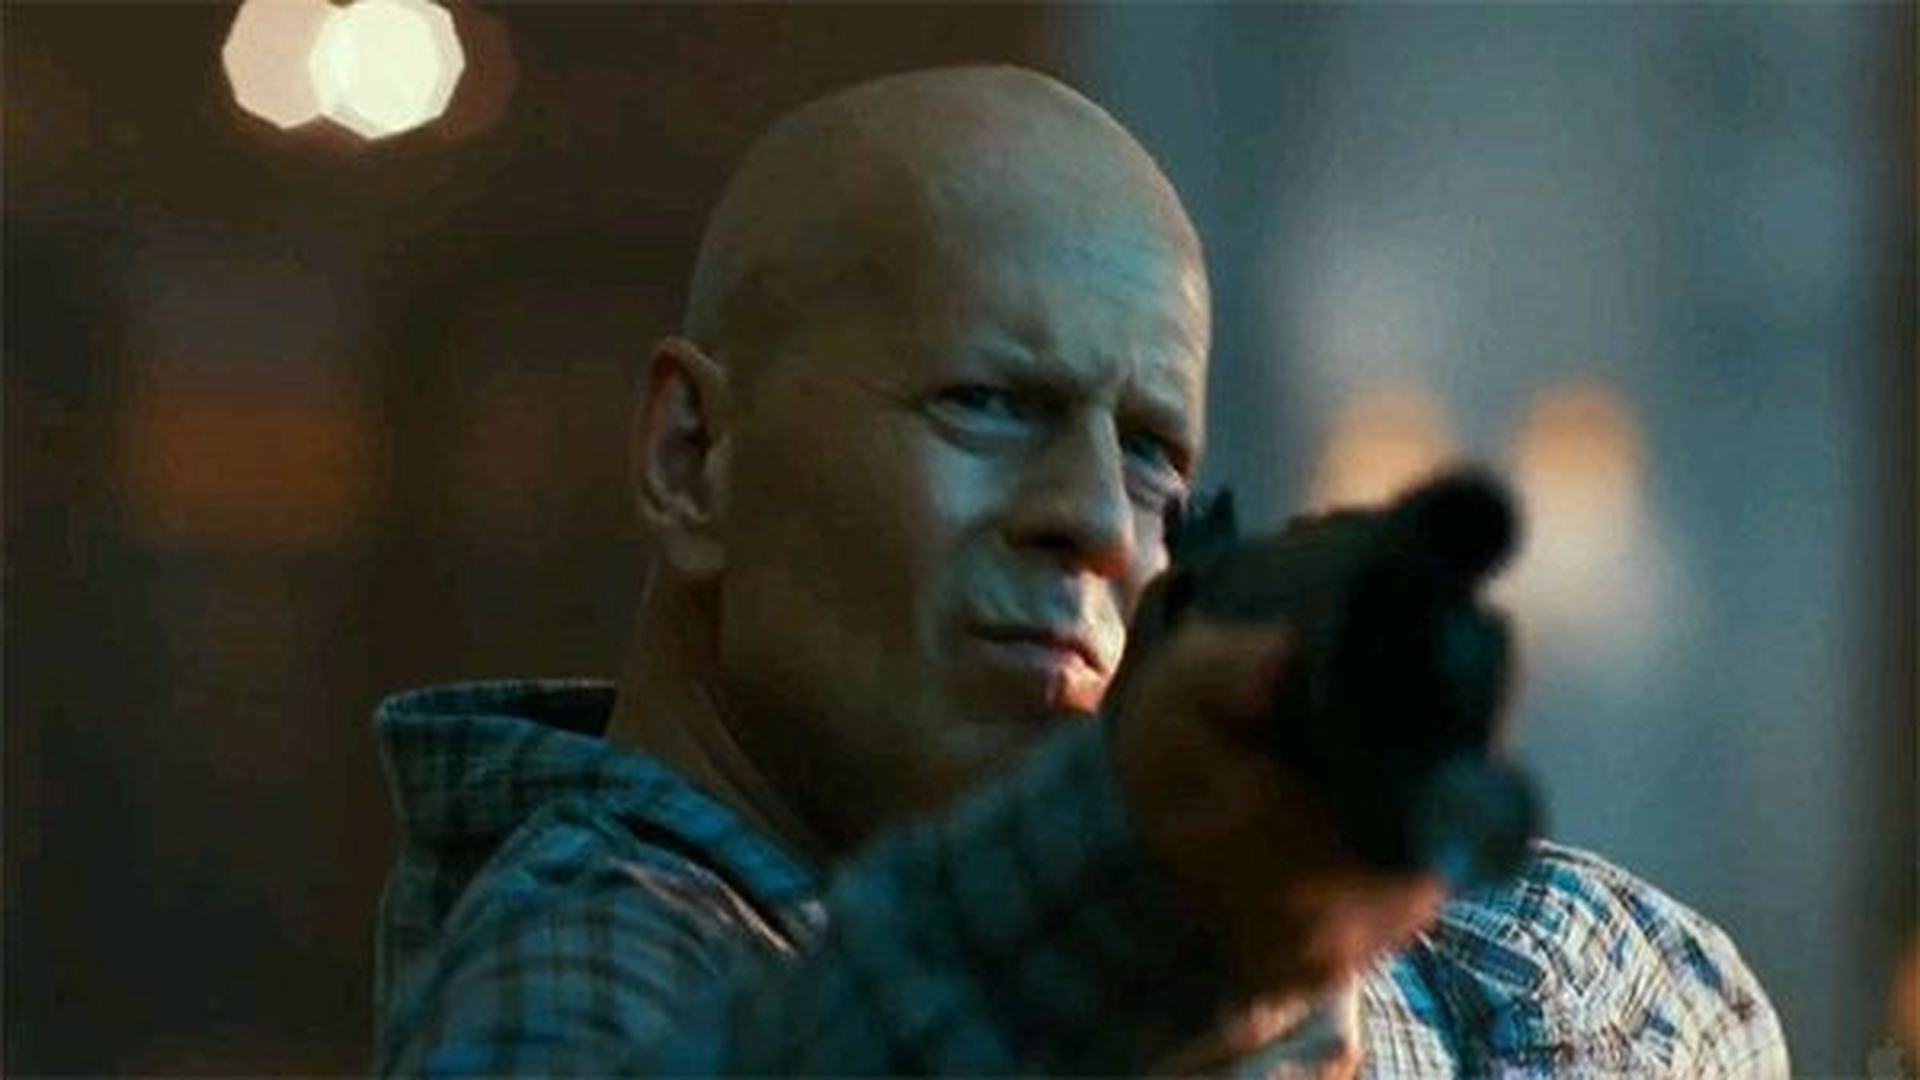 Bruce-Willis-A-Good-Day-to-Die-Hard-Trailer-2